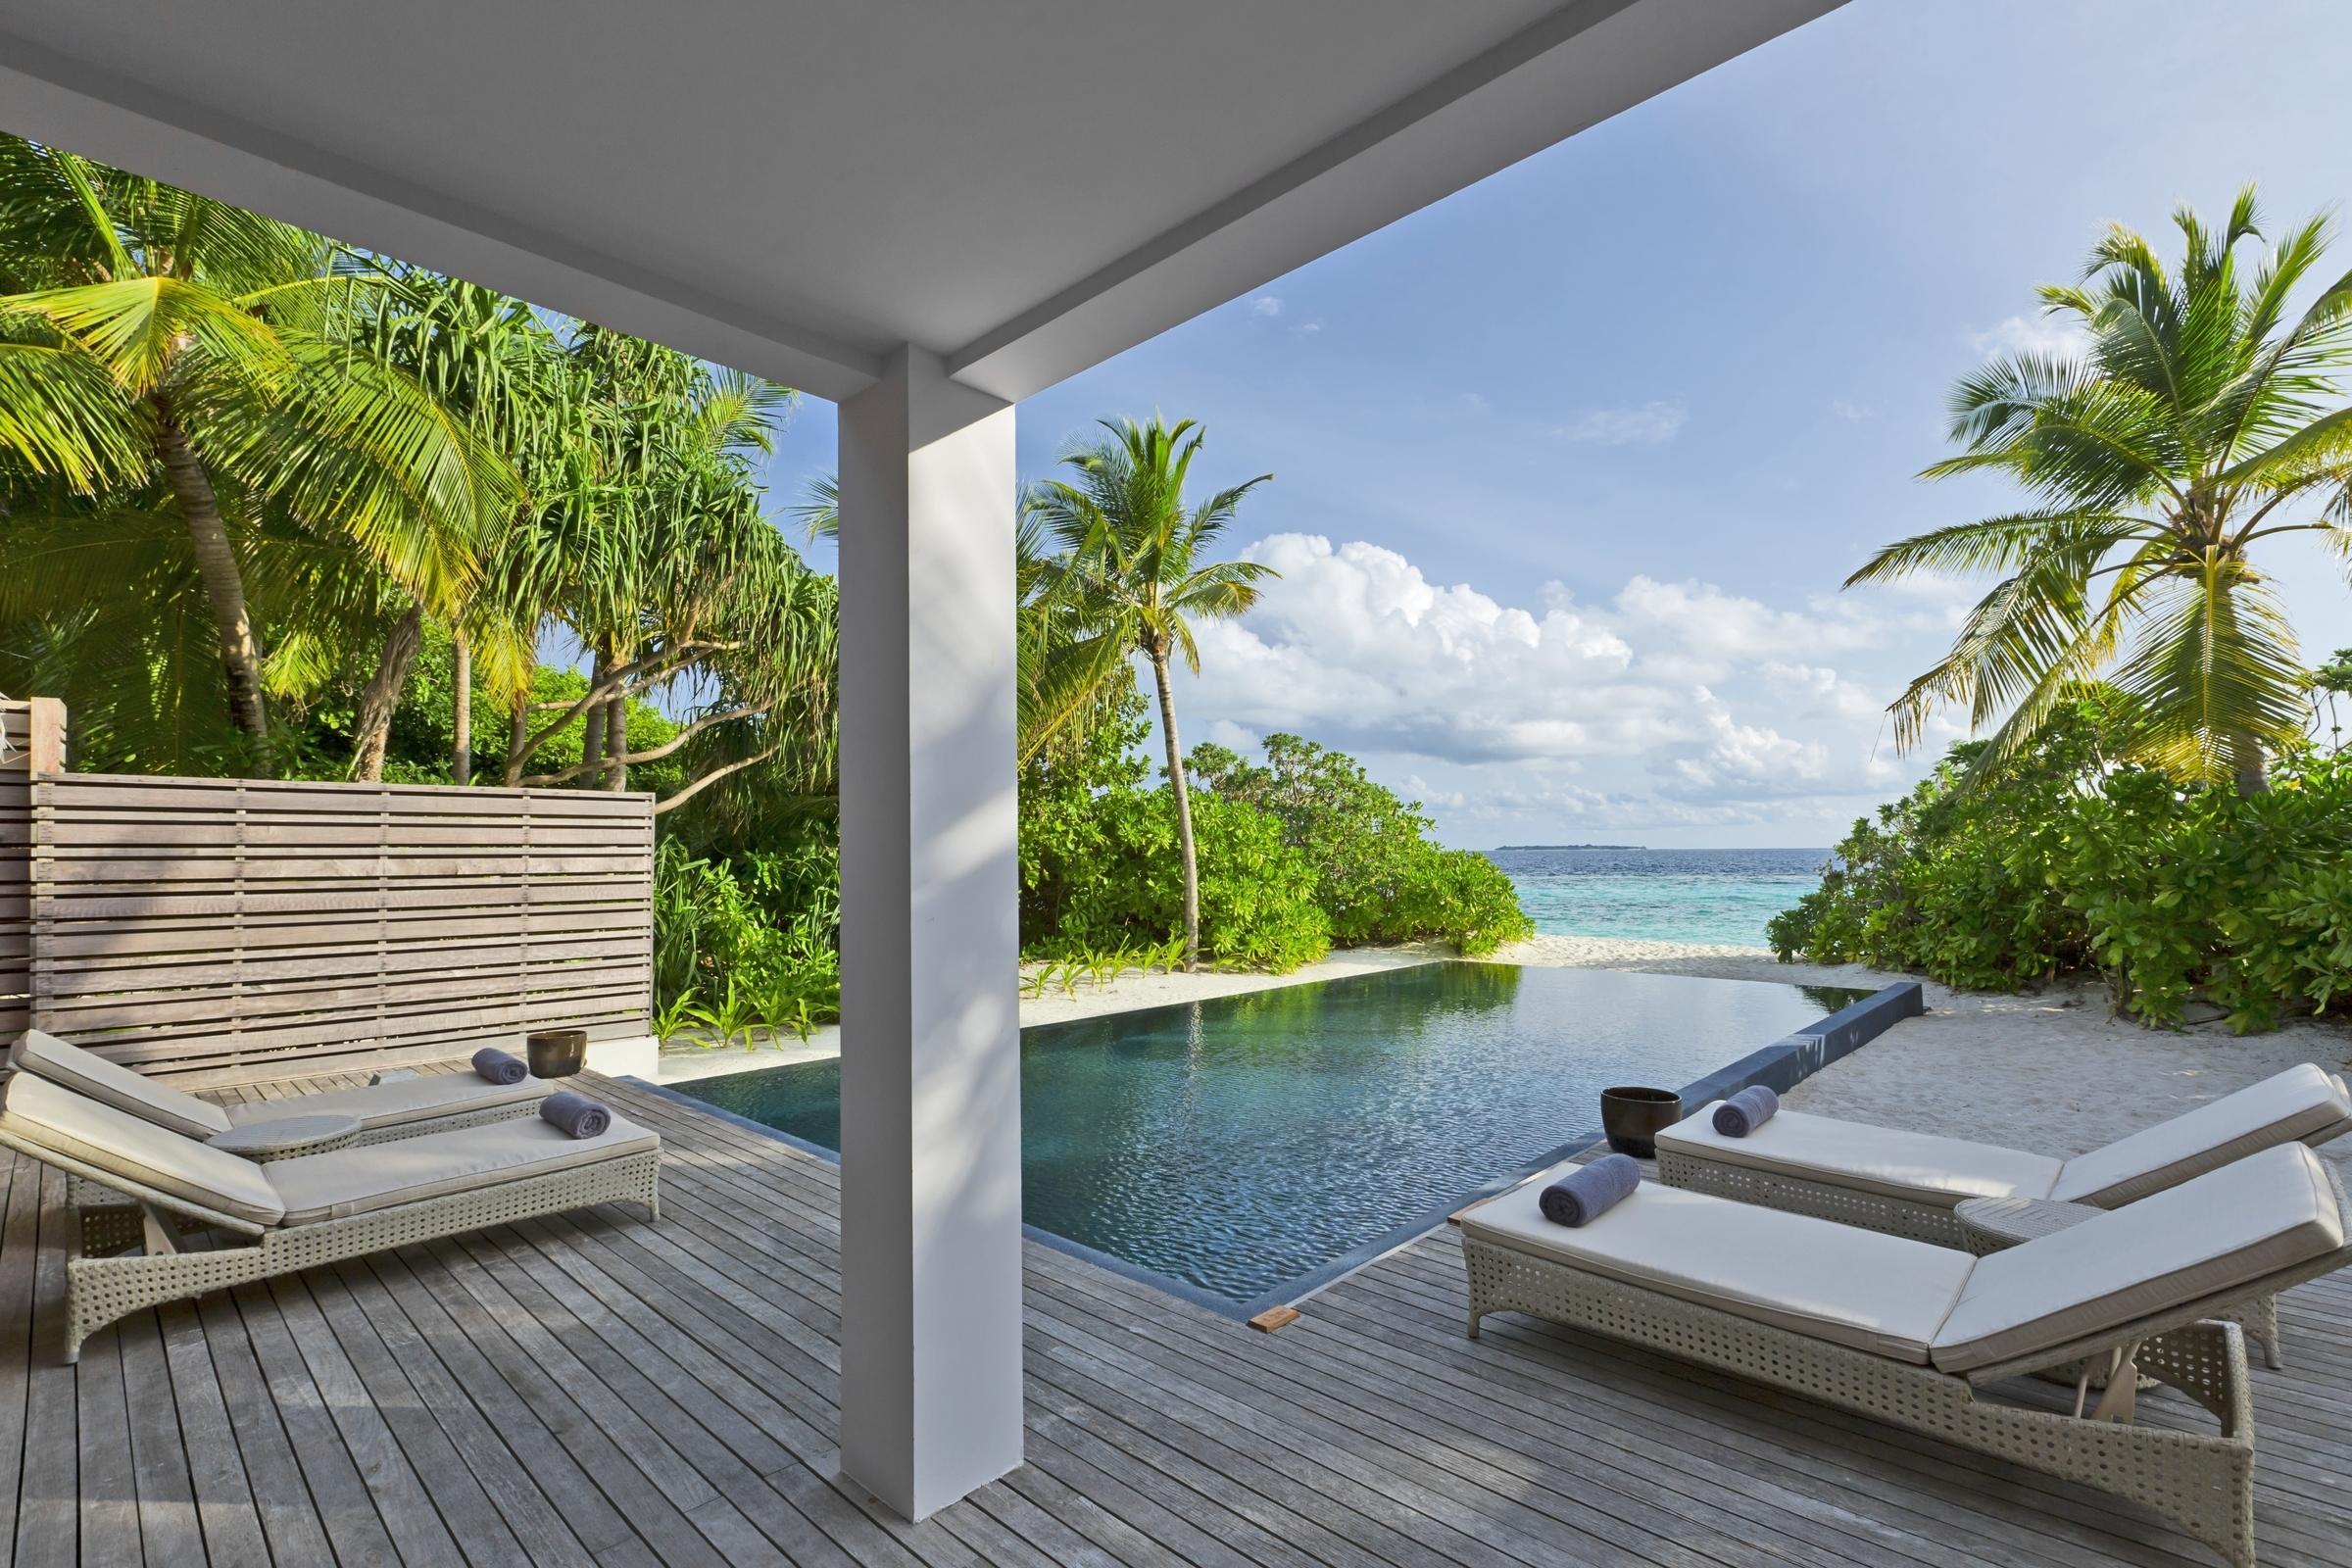 Dusit Thani Maldives Couple Getaways The Romantic Tourist